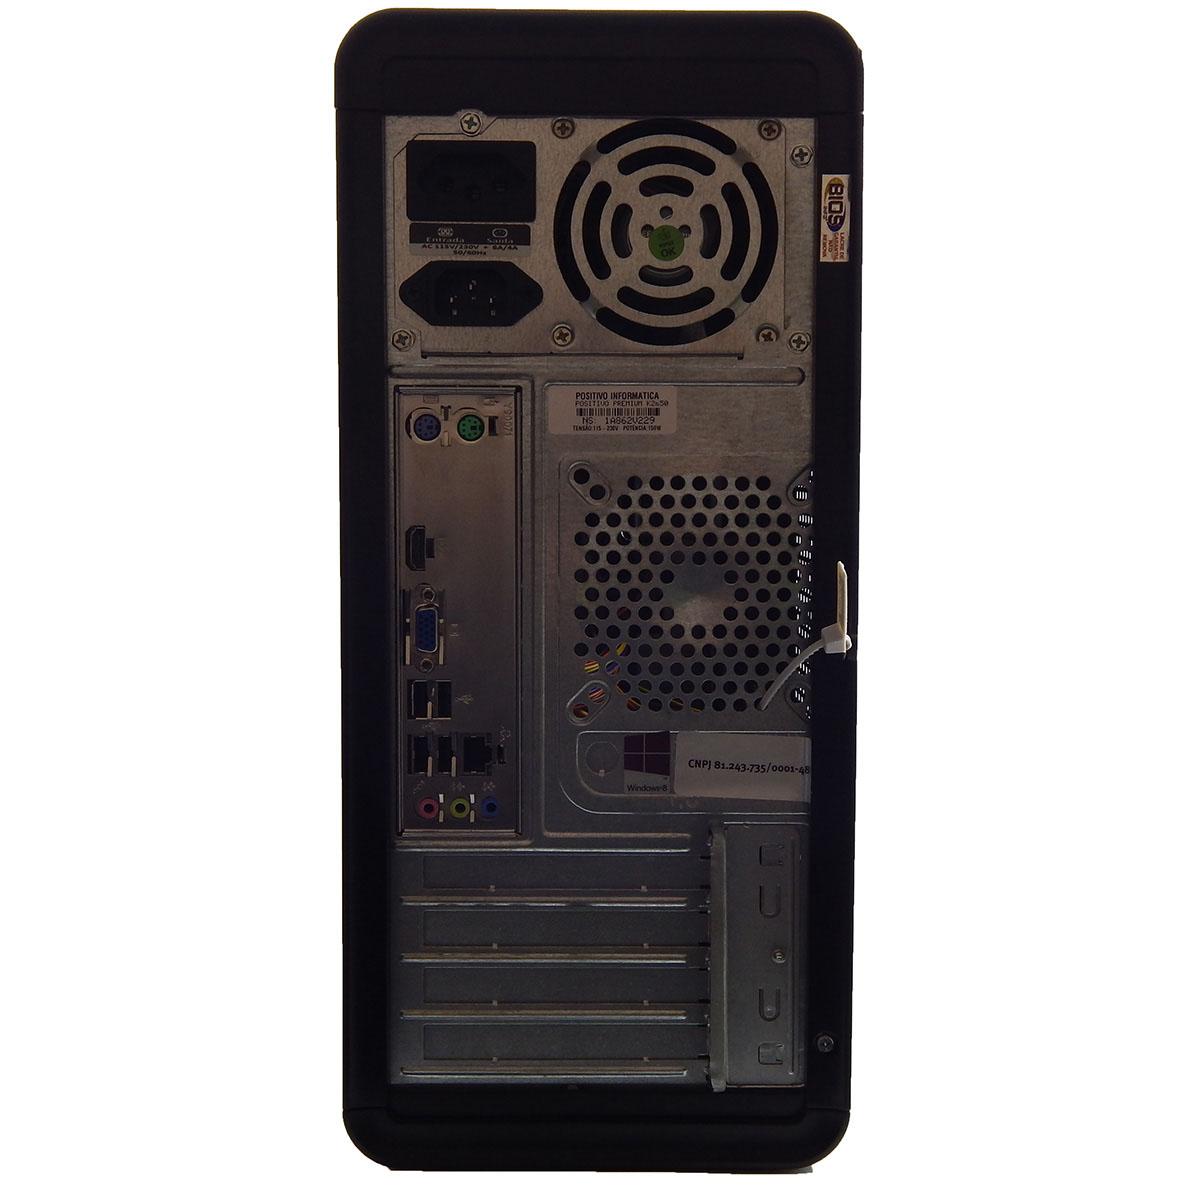 PC POSITIVO Premium K5270 I3-2120 4Gb 500Gb HD Gravador DVD - Reembalado